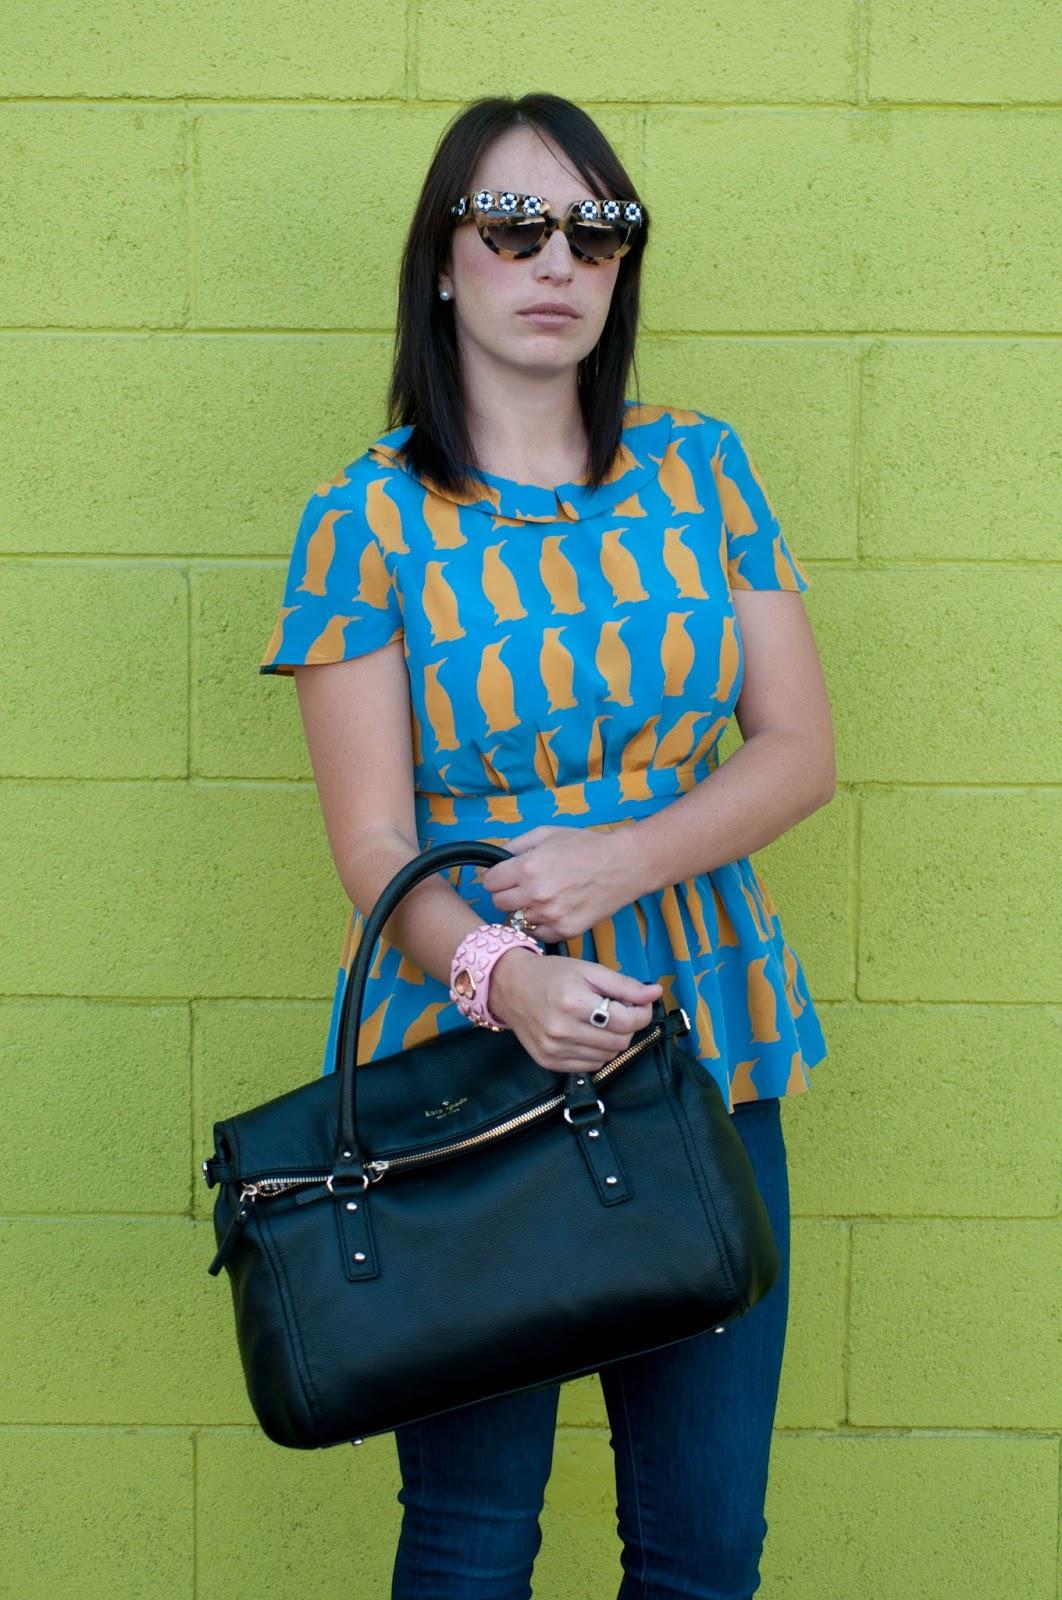 ootd, fashion blog, style blog, charlotte taylor penguin chiffon blouse, prada flower sunglasses, kate spade cobble hill